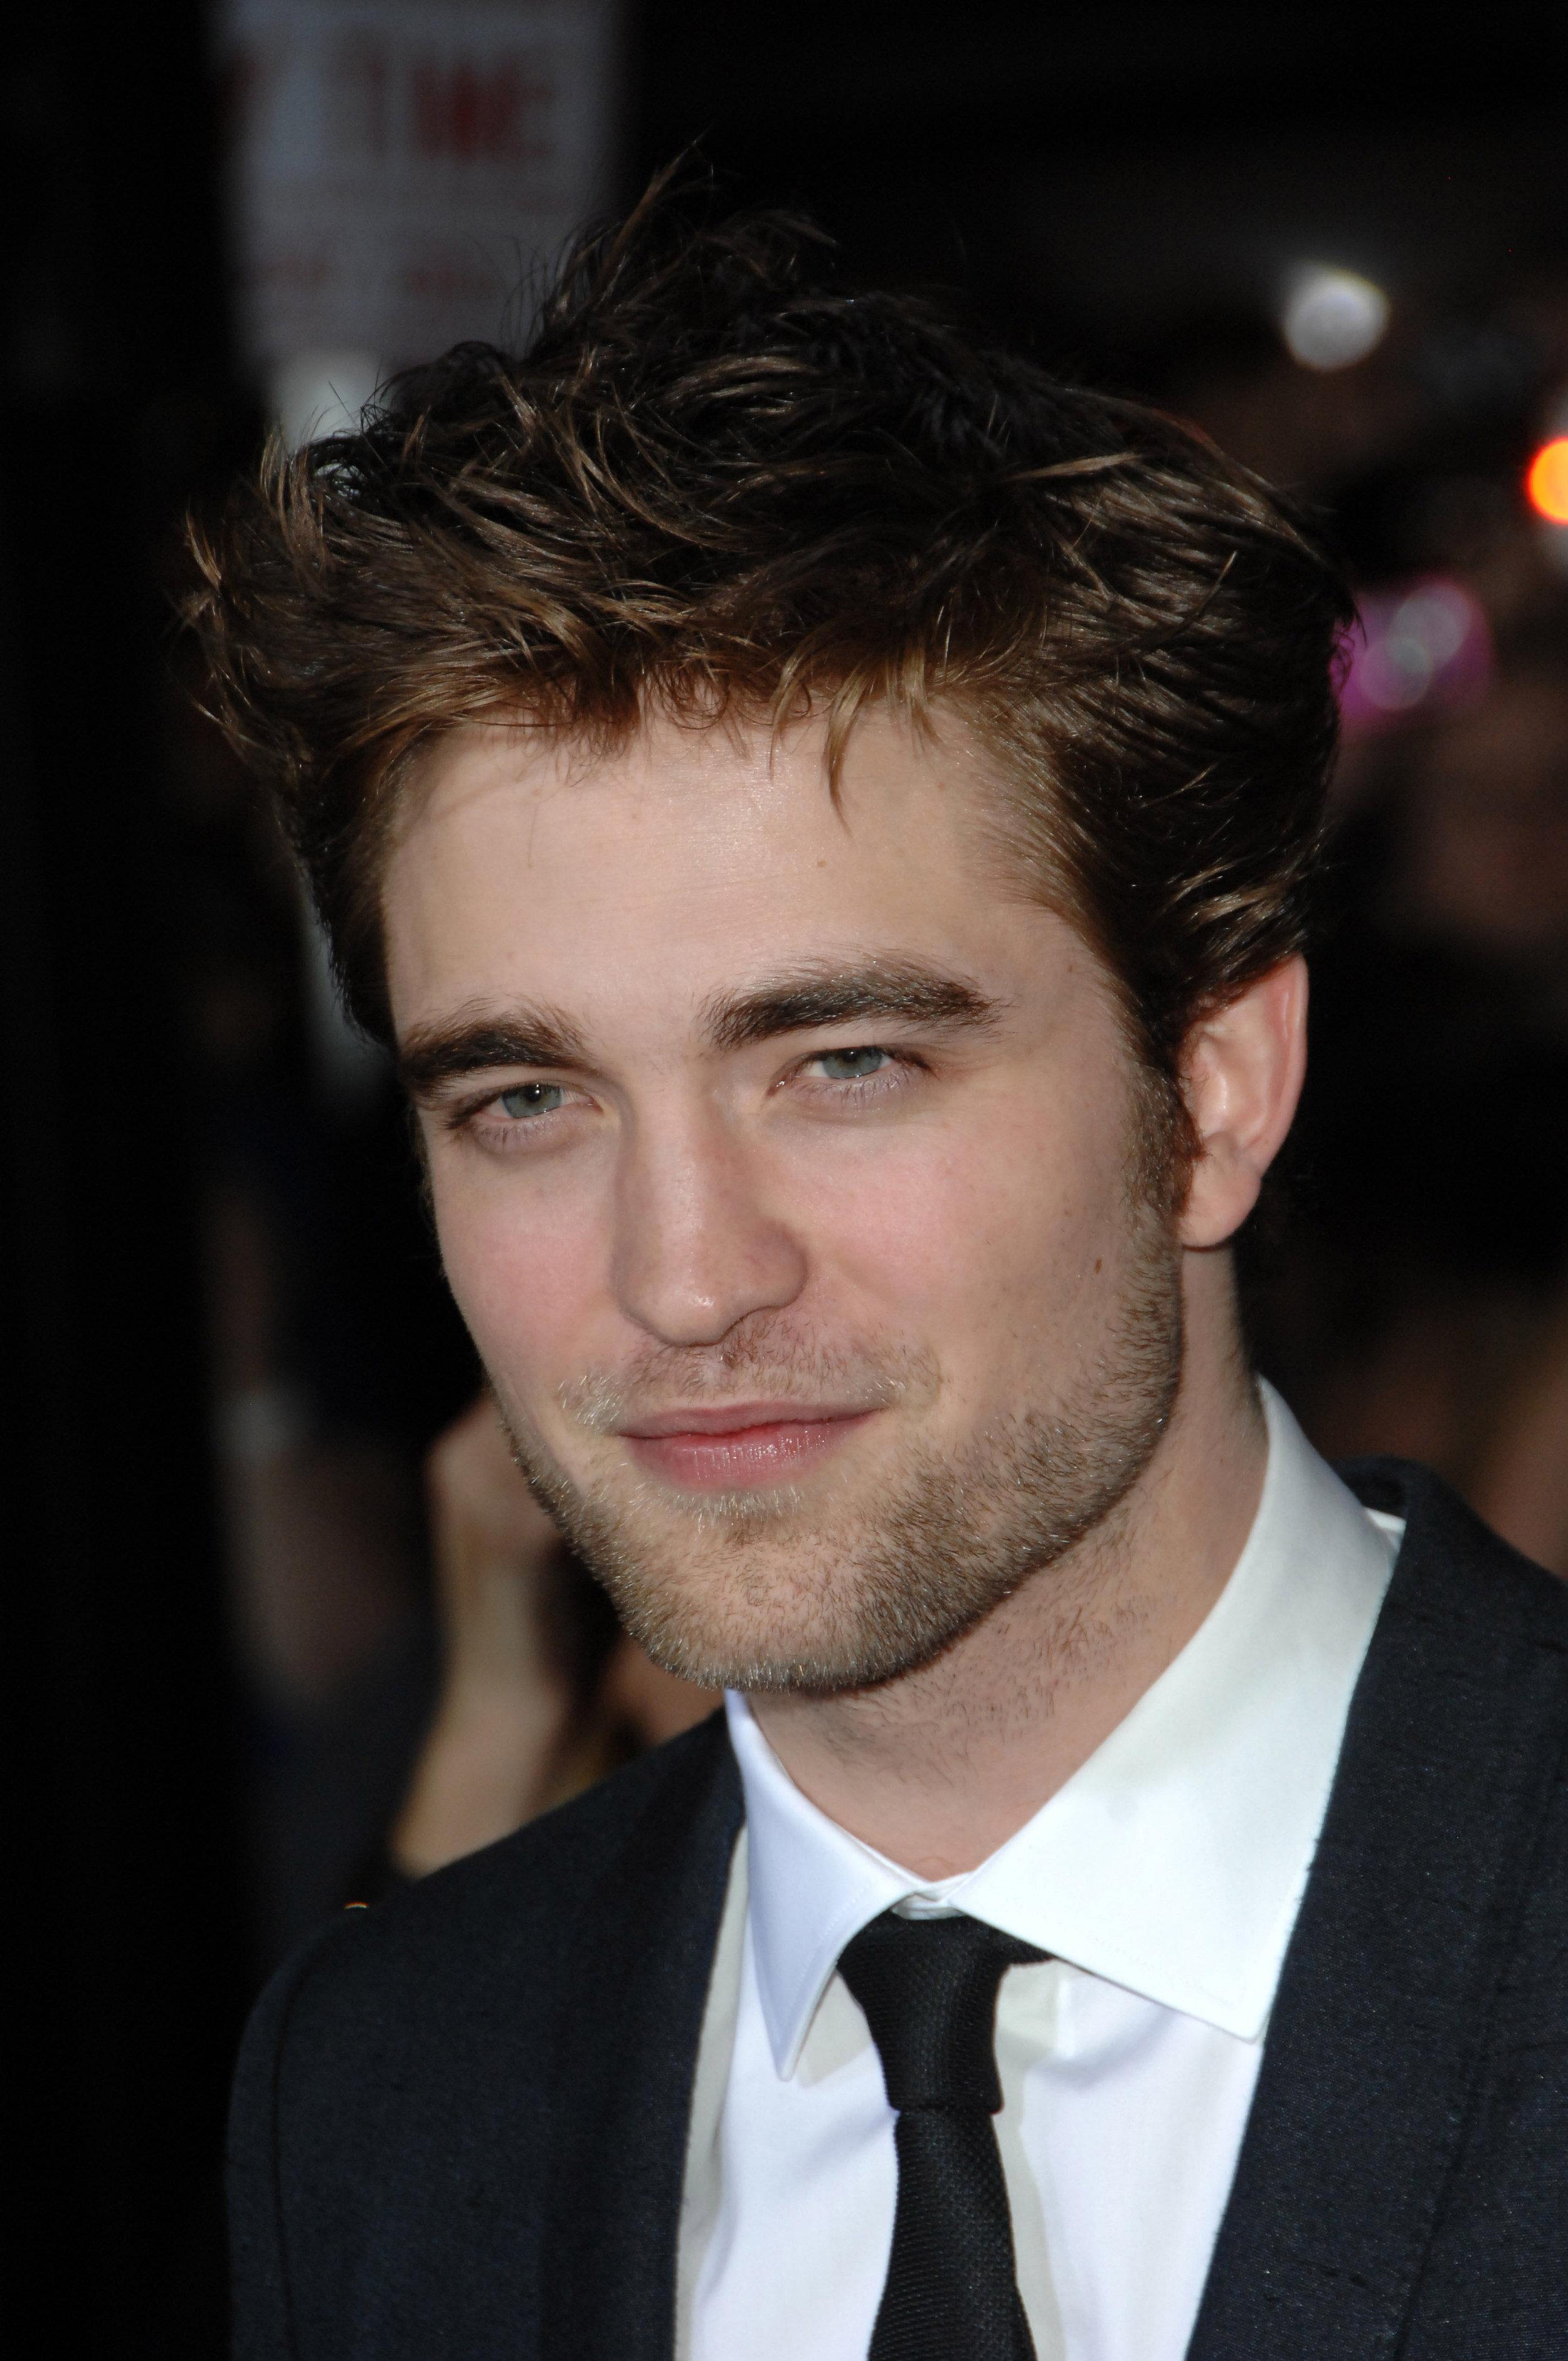 Robert Pattinson - Cain